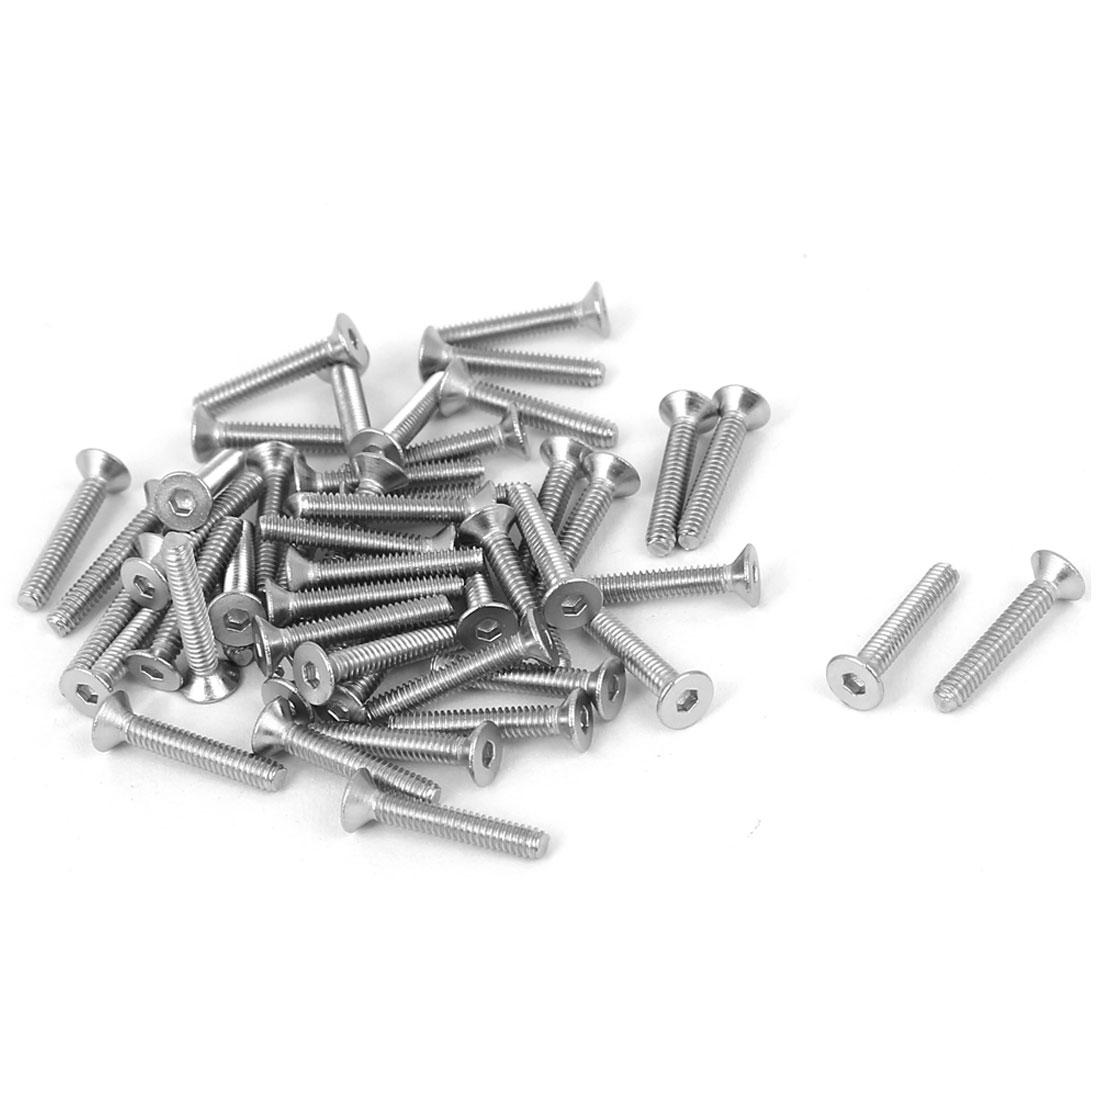 M2 x 12mm 304 Stainless Steel Hex Socket Countersunk Flat Head Screw Bolts 50pcs